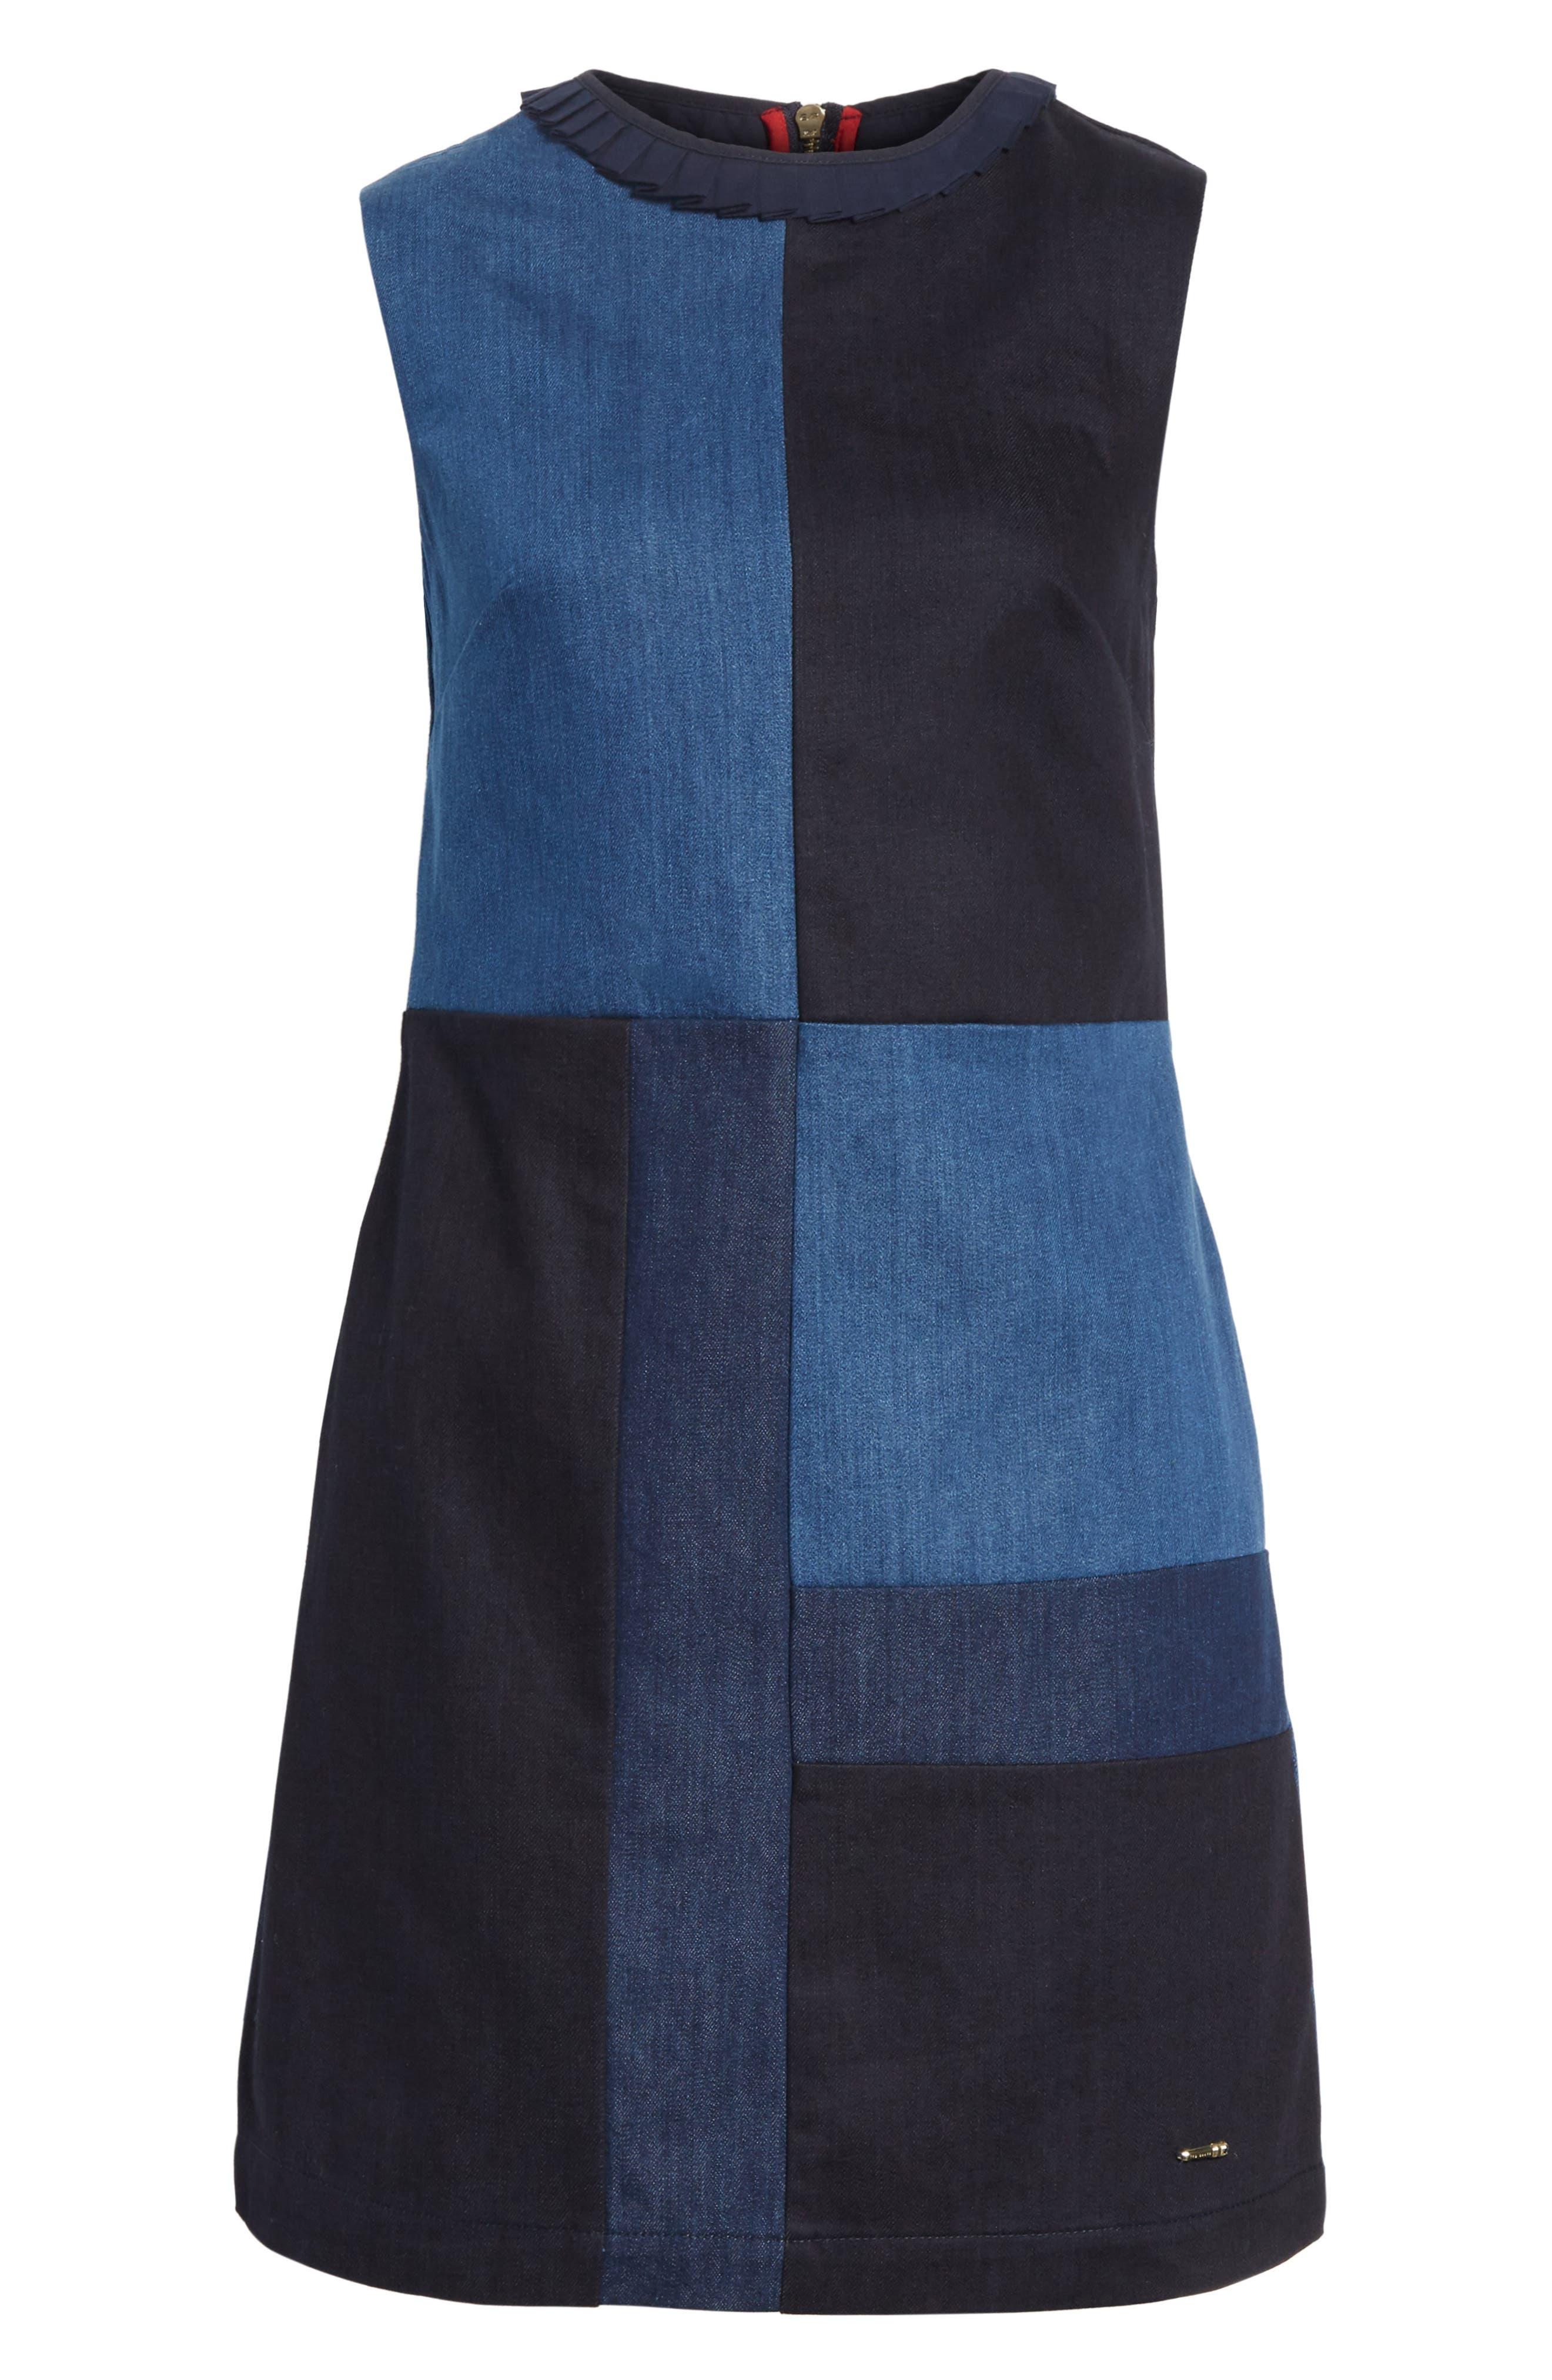 Ted Baker Morfee London Colorblock Denim A-Line Dress,                             Alternate thumbnail 6, color,                             Mid Wash